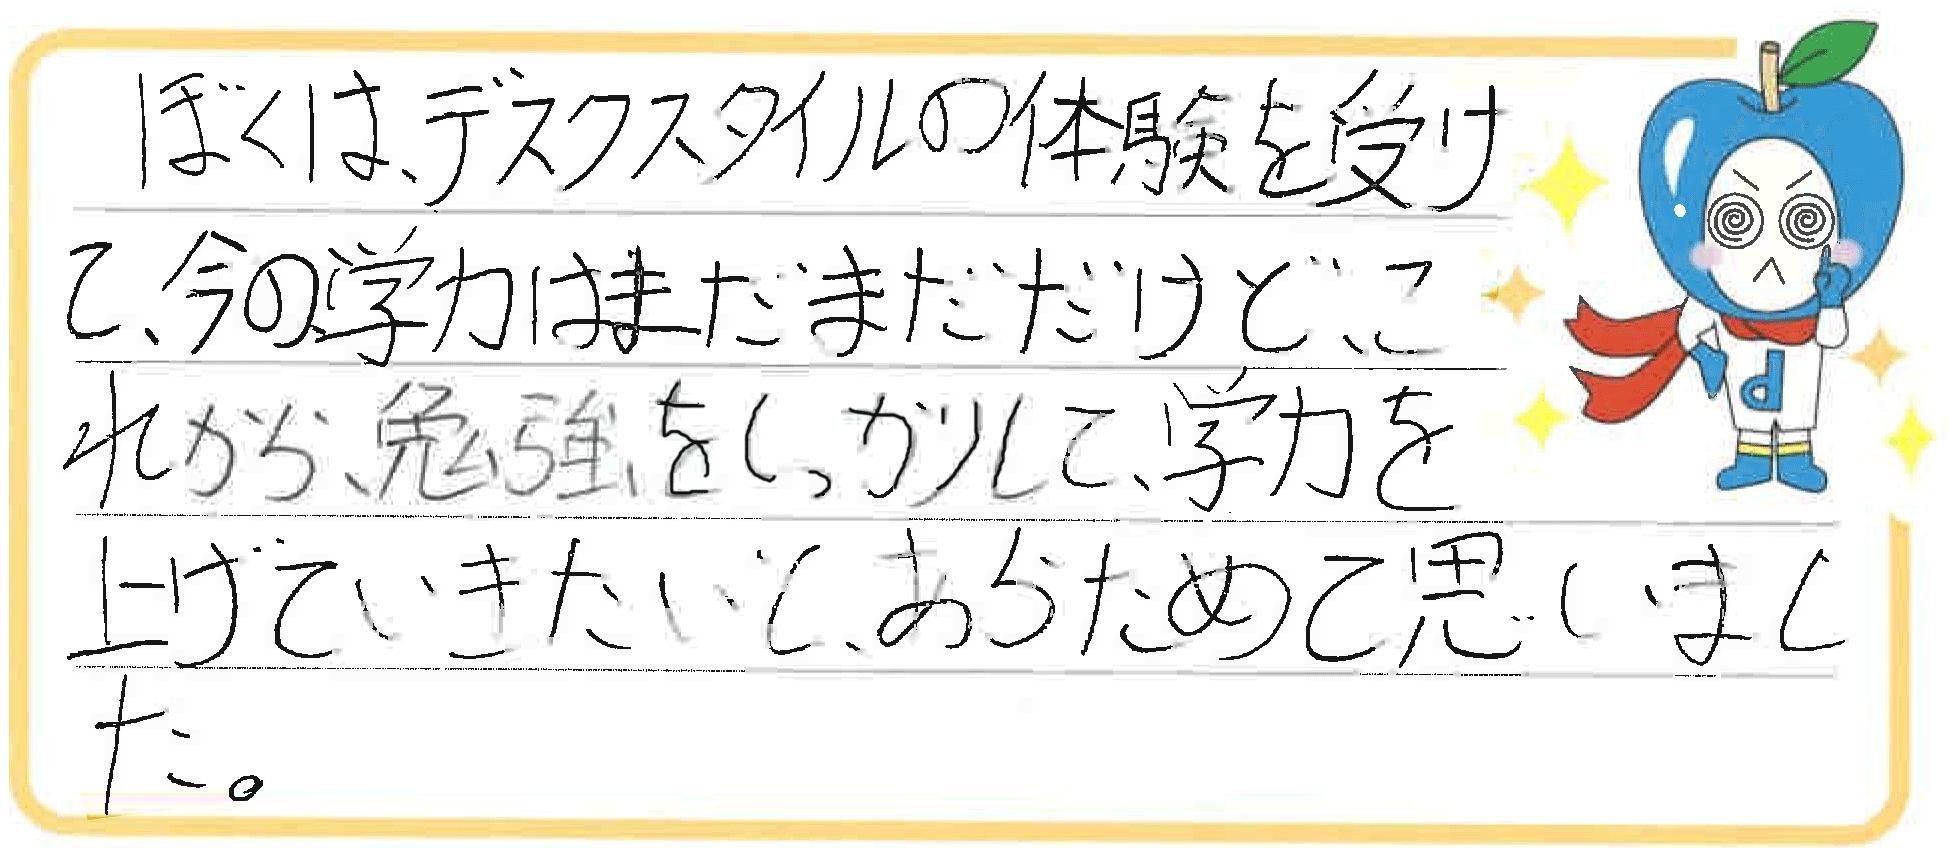 G君(小松市)からの口コミ